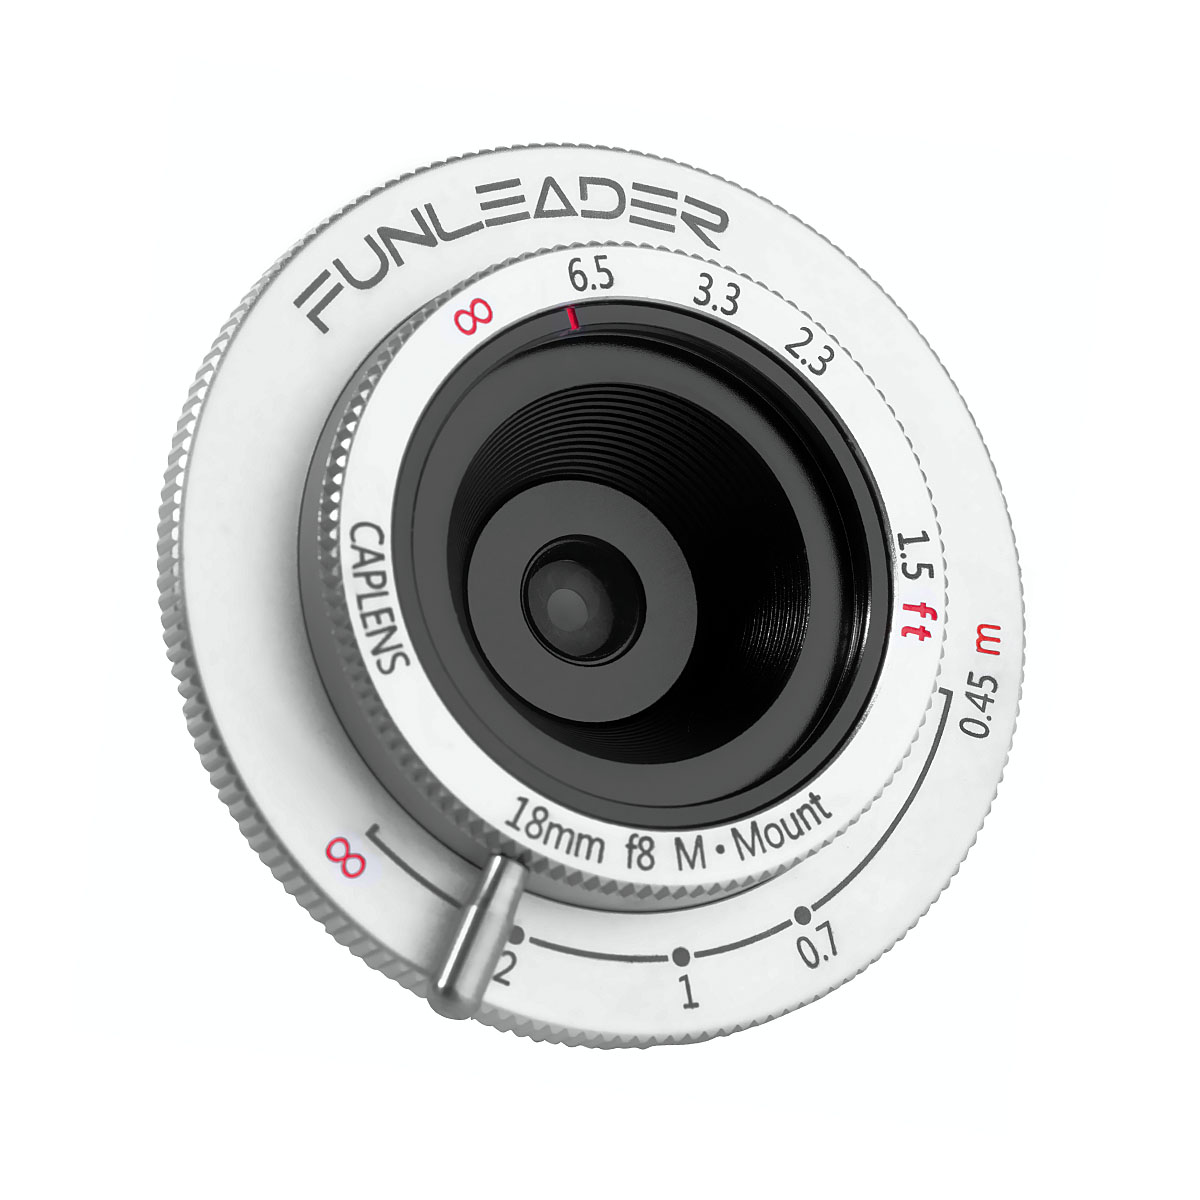 FUNLEADER CAPLENS 18mm f/8.0 M ライカMマウント